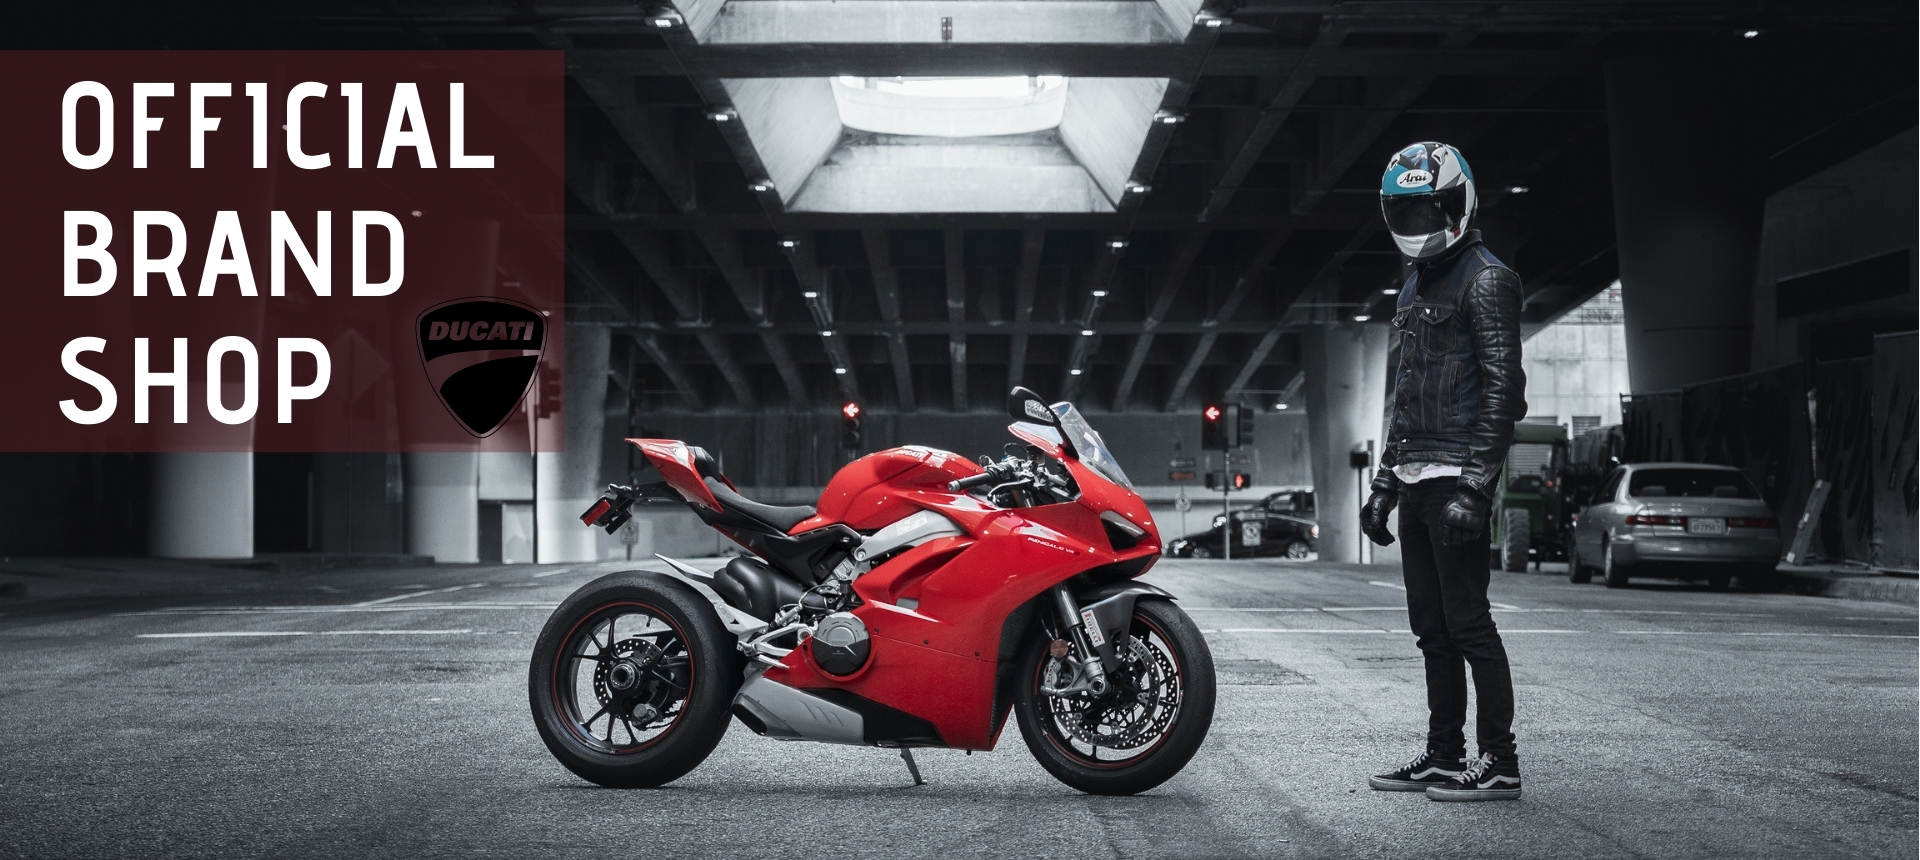 Ducati Brand